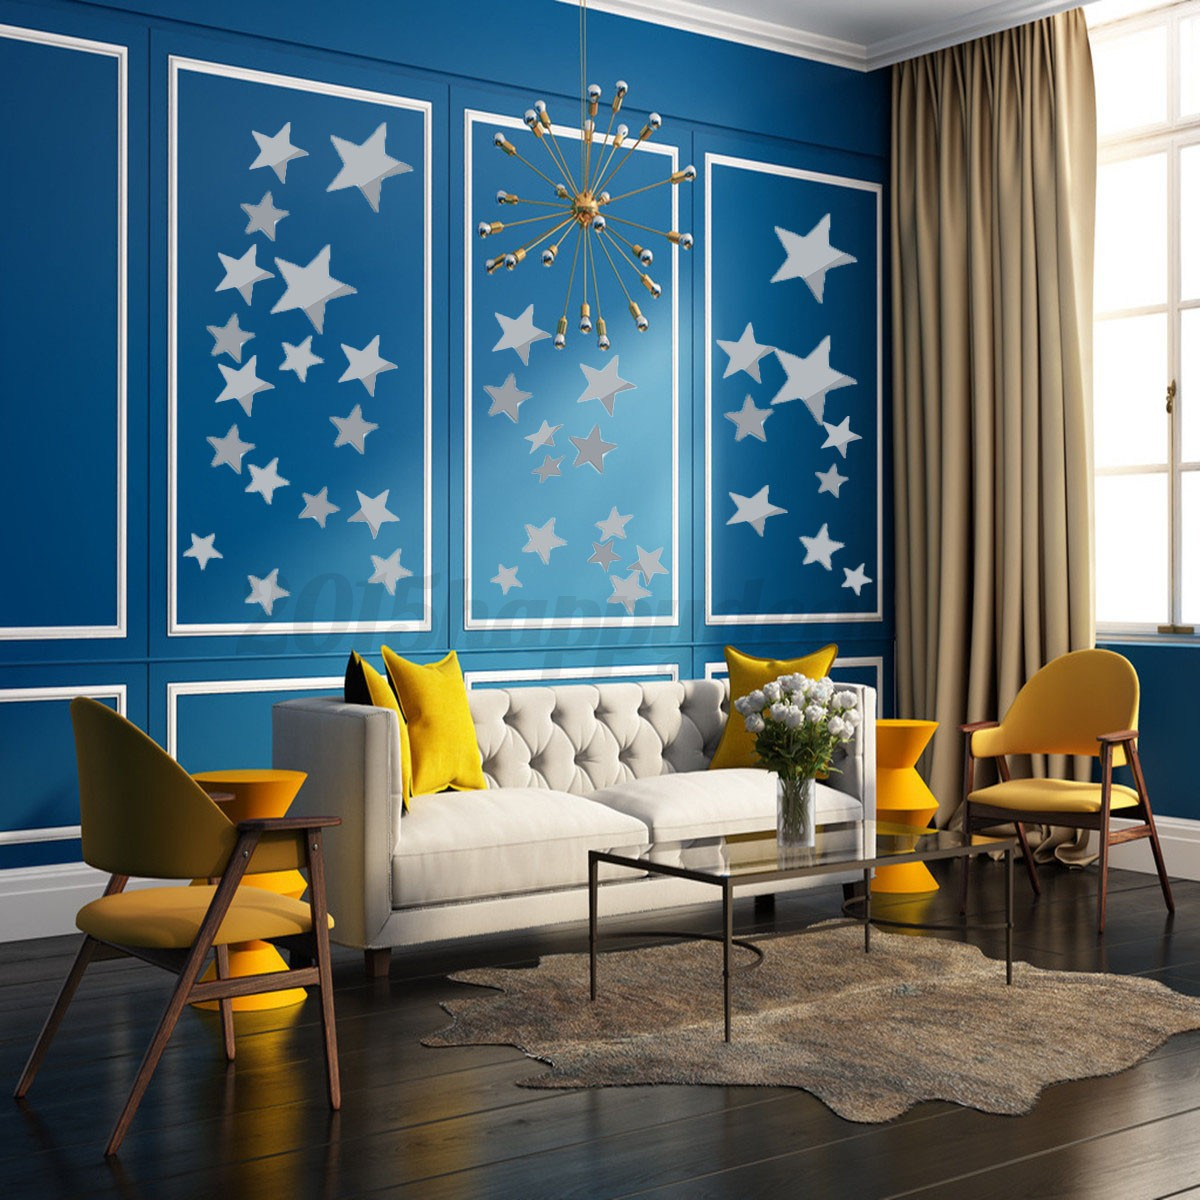 Mirrored Star Wall Decor: Fashion Star Mirror DIY Wall Ceiling Home Decal Mural